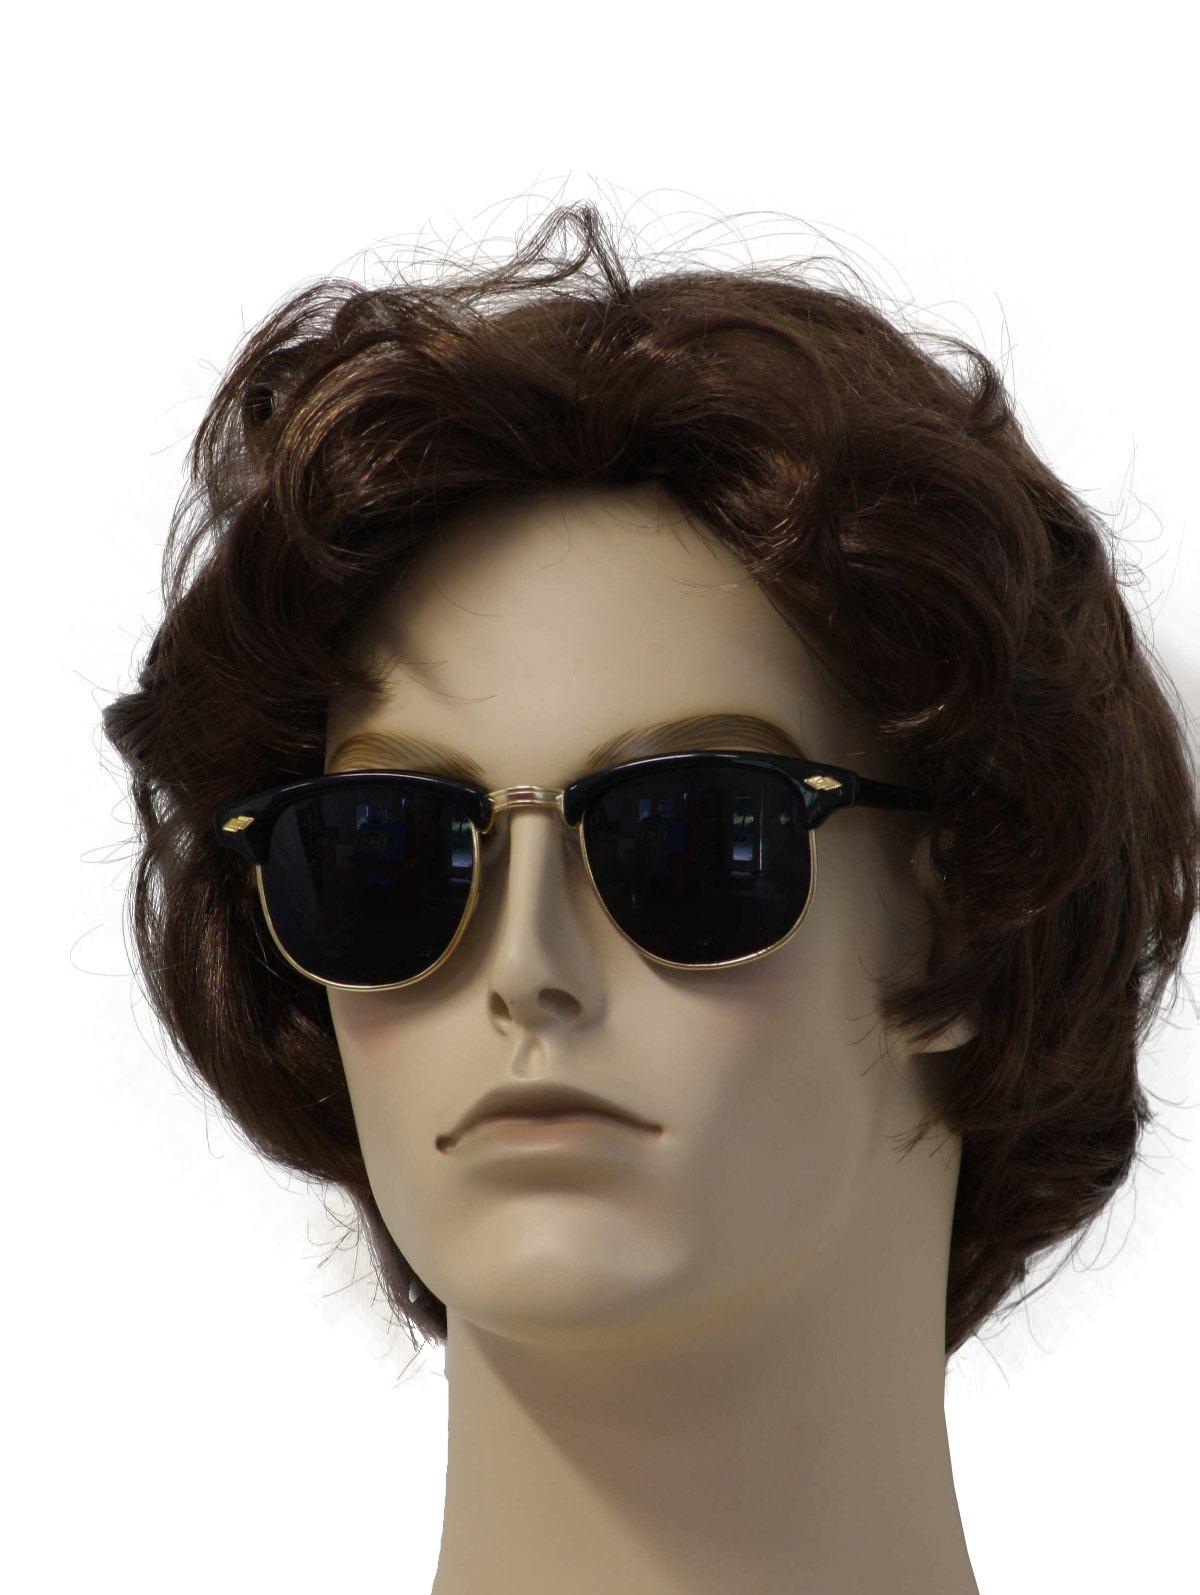 Oversized Wayfarer Sunglasses Men  mens vintage sunglasses at rustyzipper com vintage clothing